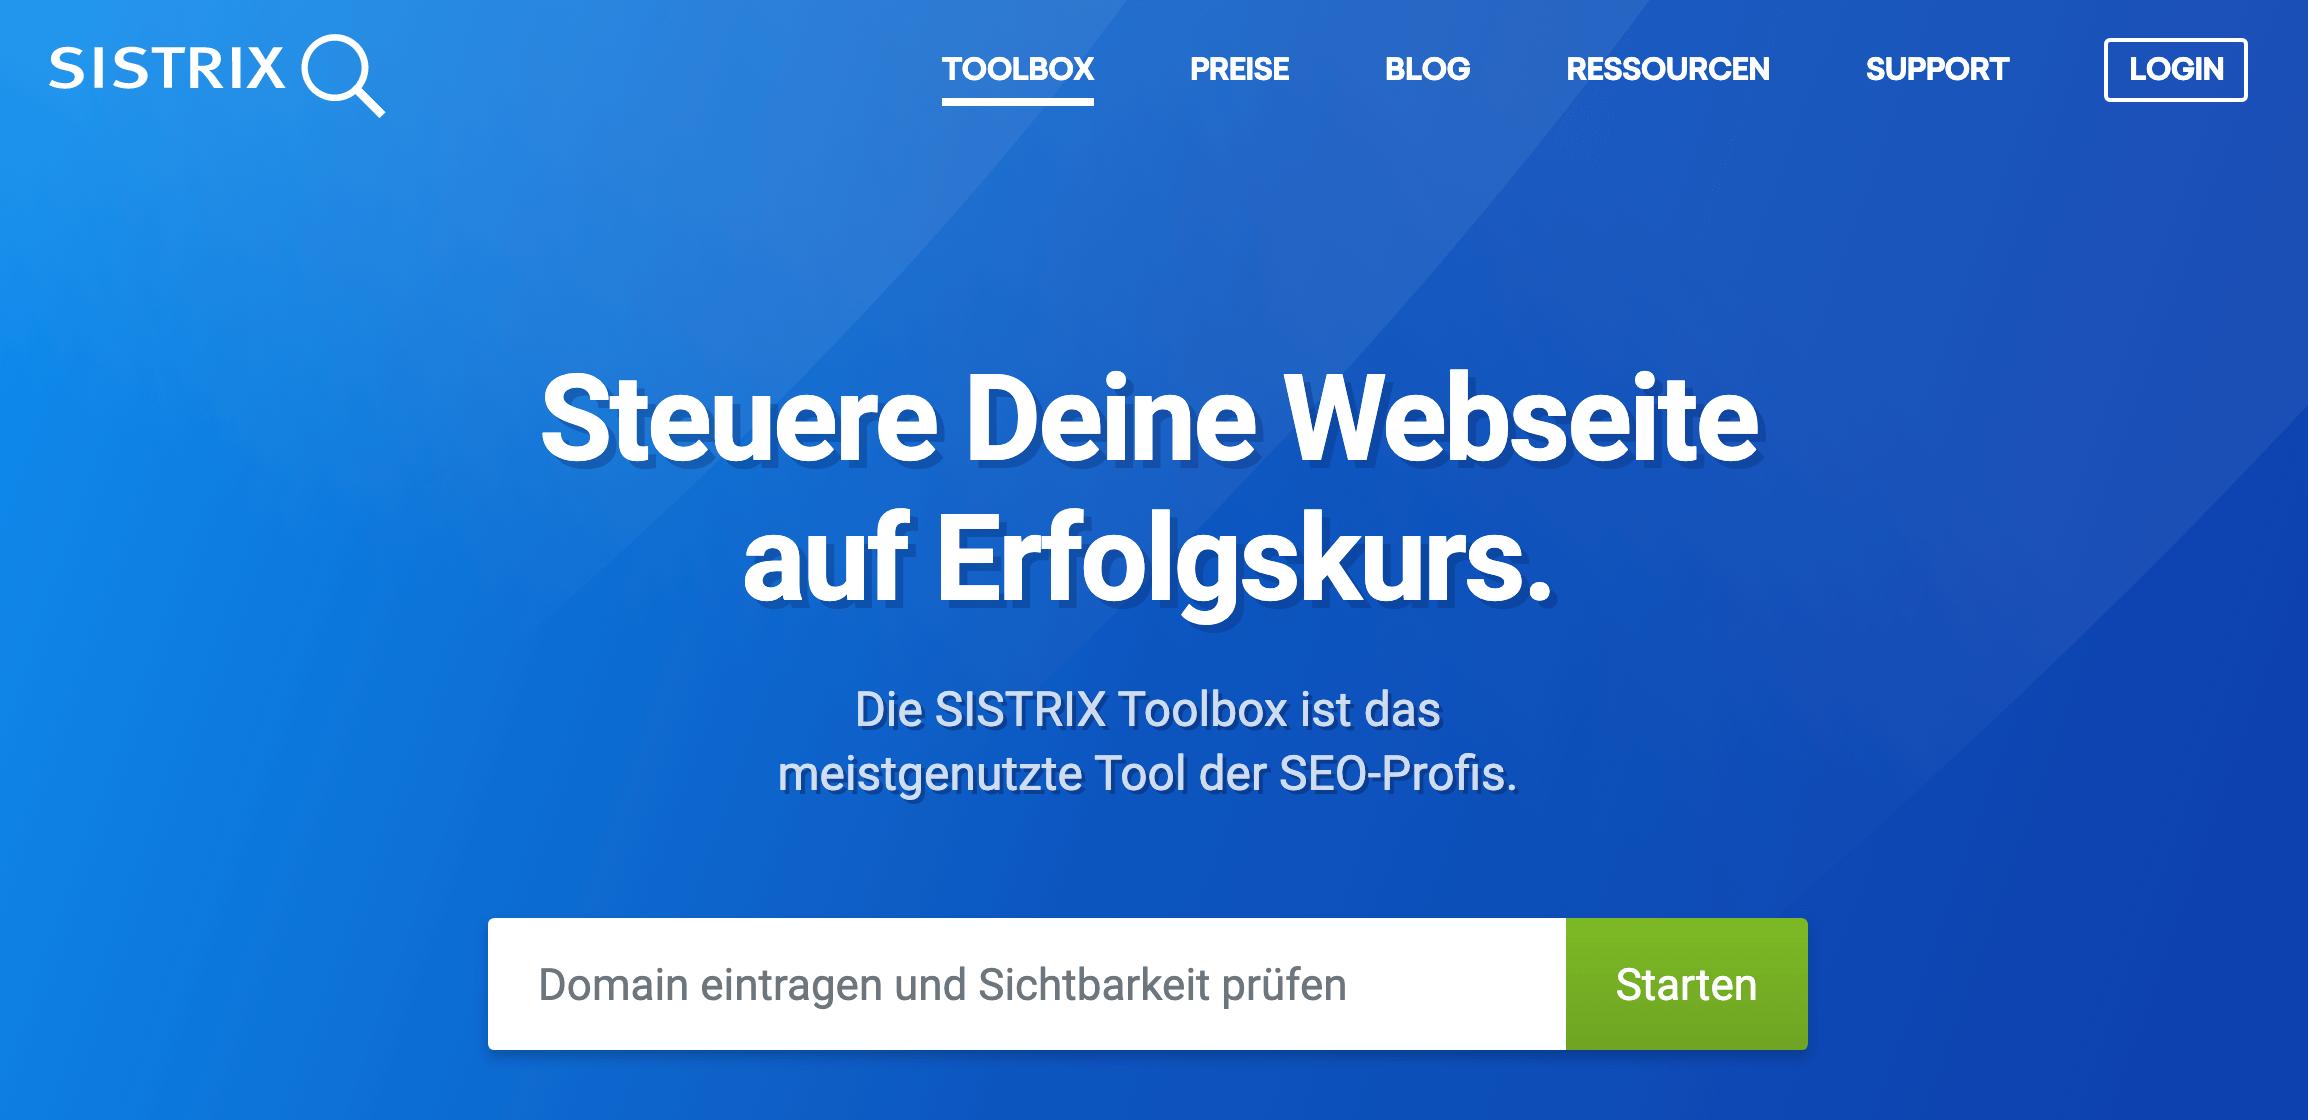 Sistrix ist das SEO-Tool der Profis.